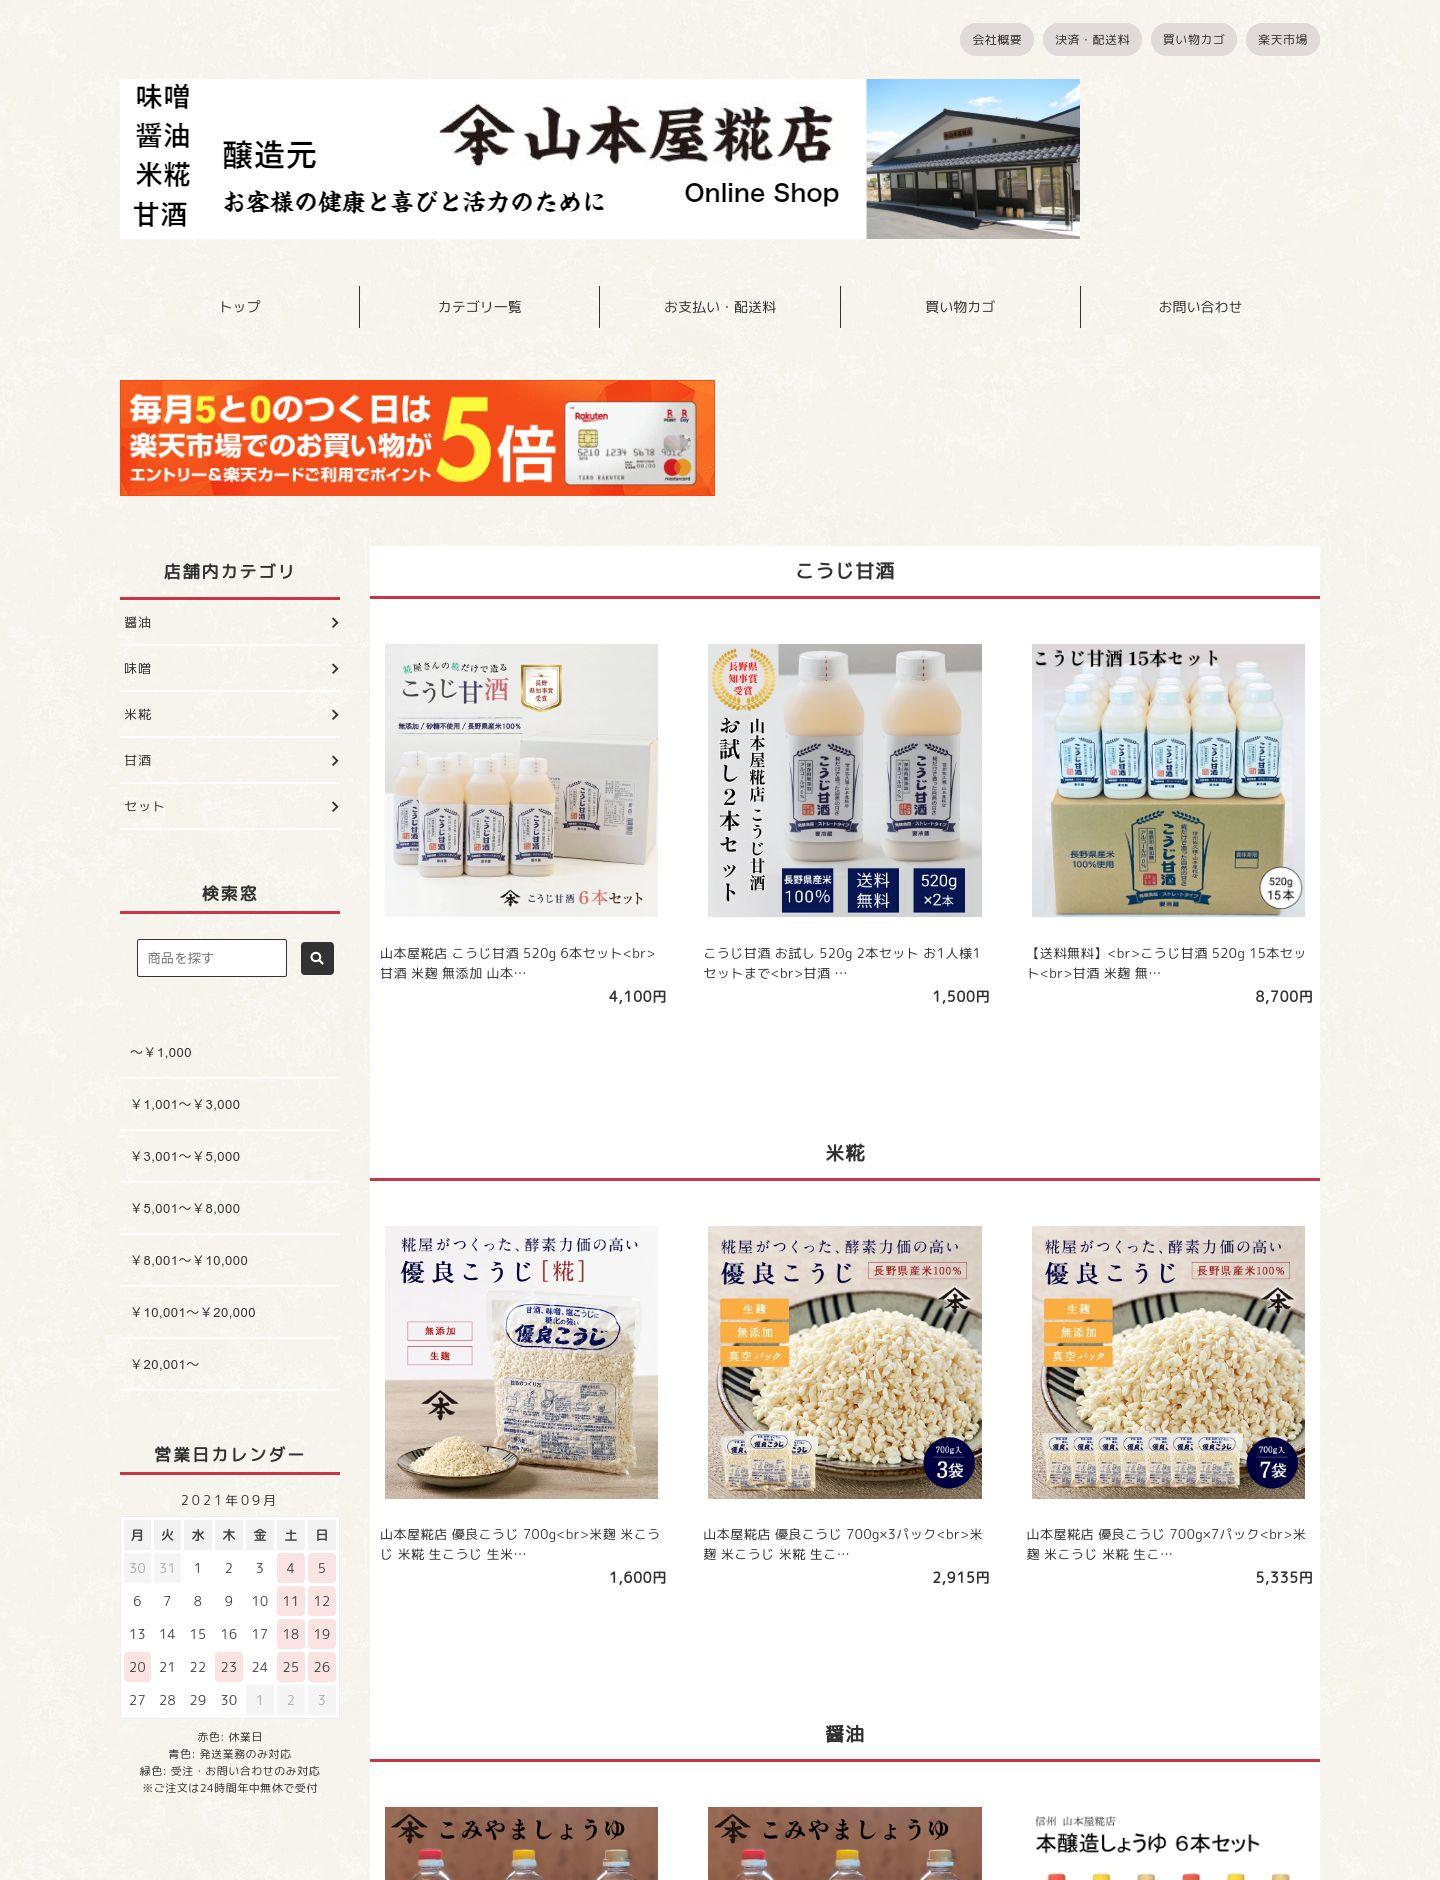 山本屋糀店様 サイト画像